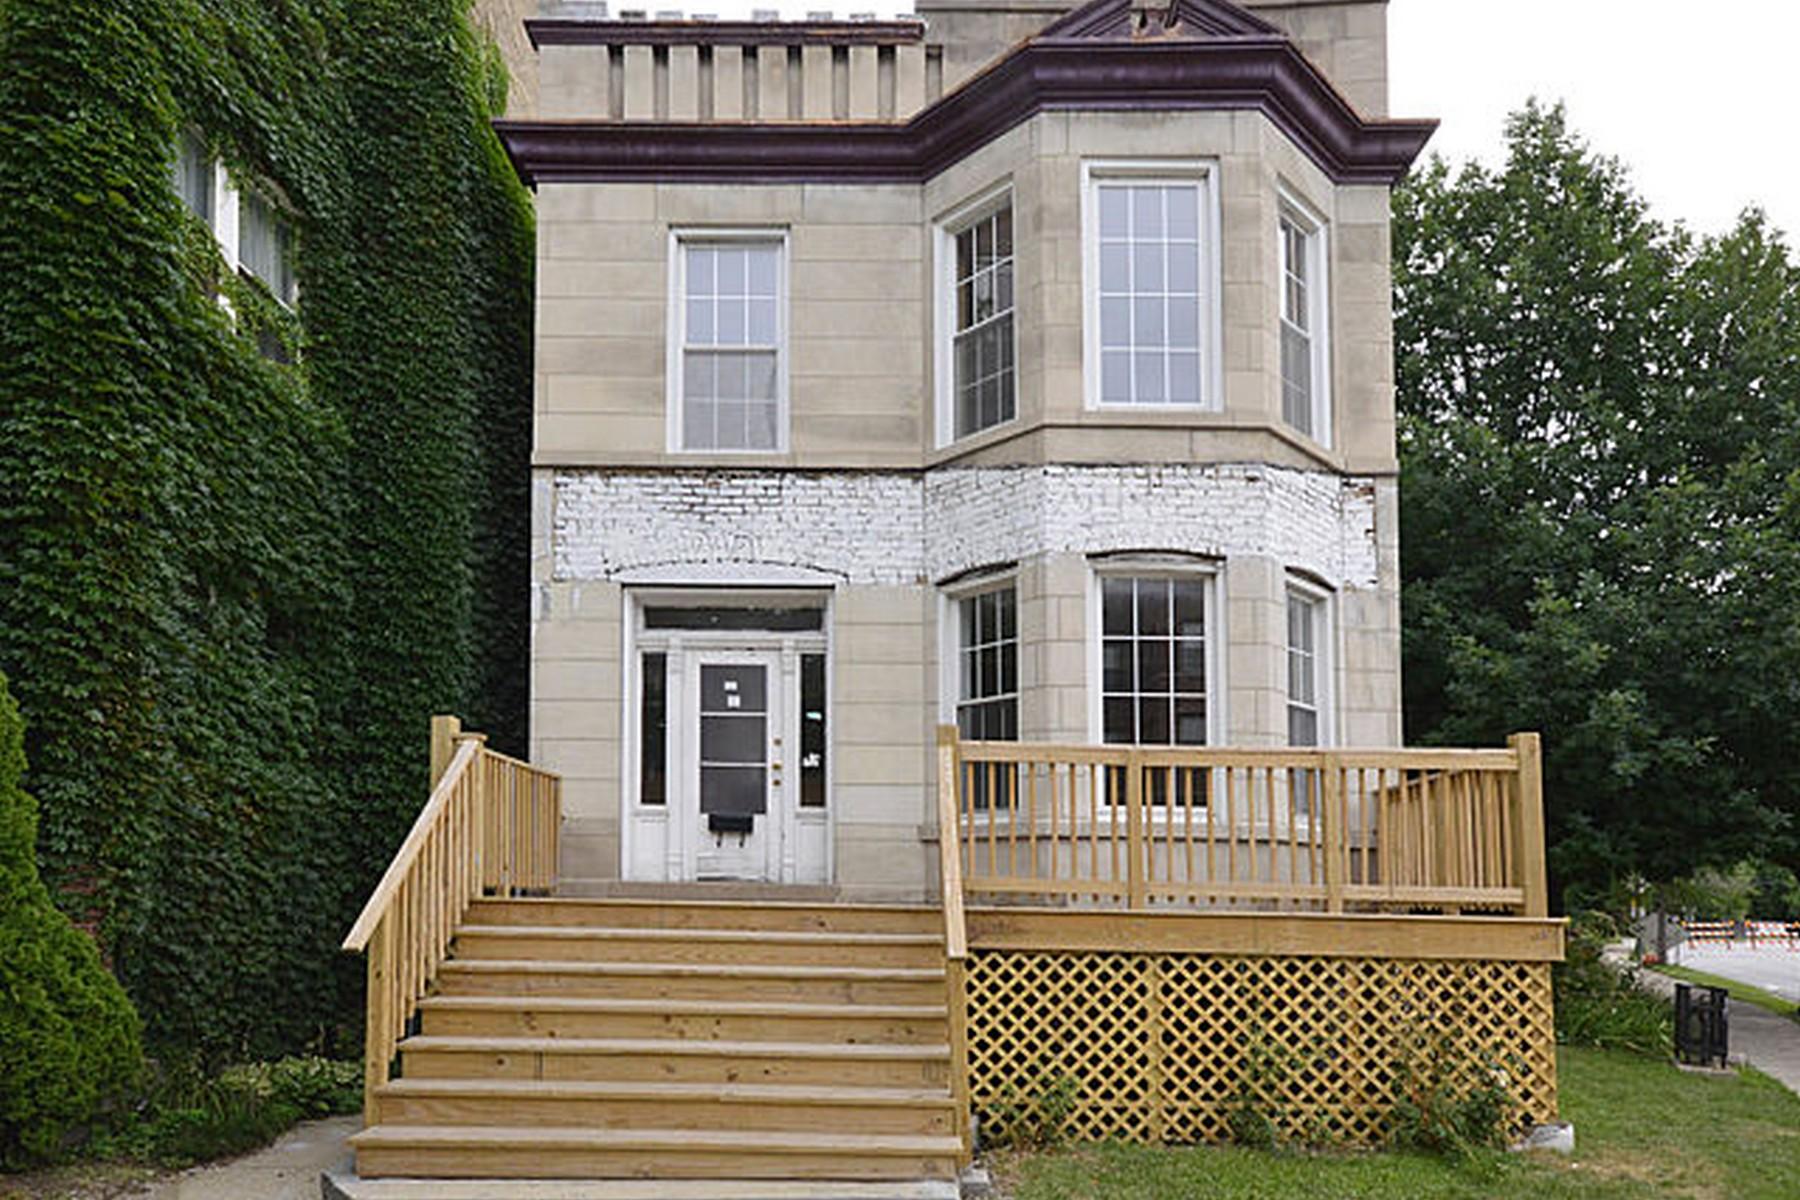 公寓 为 销售 在 Excellent Two Unit With So Much Space! 5679 N Ridge Avenue 芝加哥, 伊利诺斯州, 60660 美国